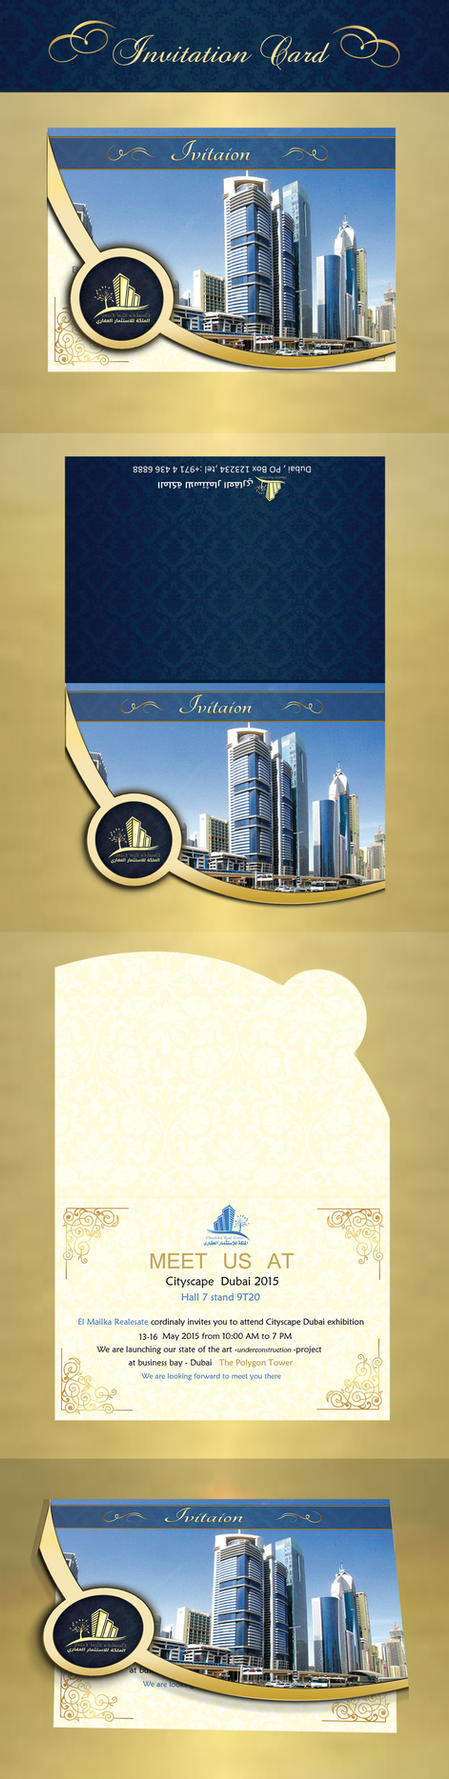 Invitation Card by dinaTahoun